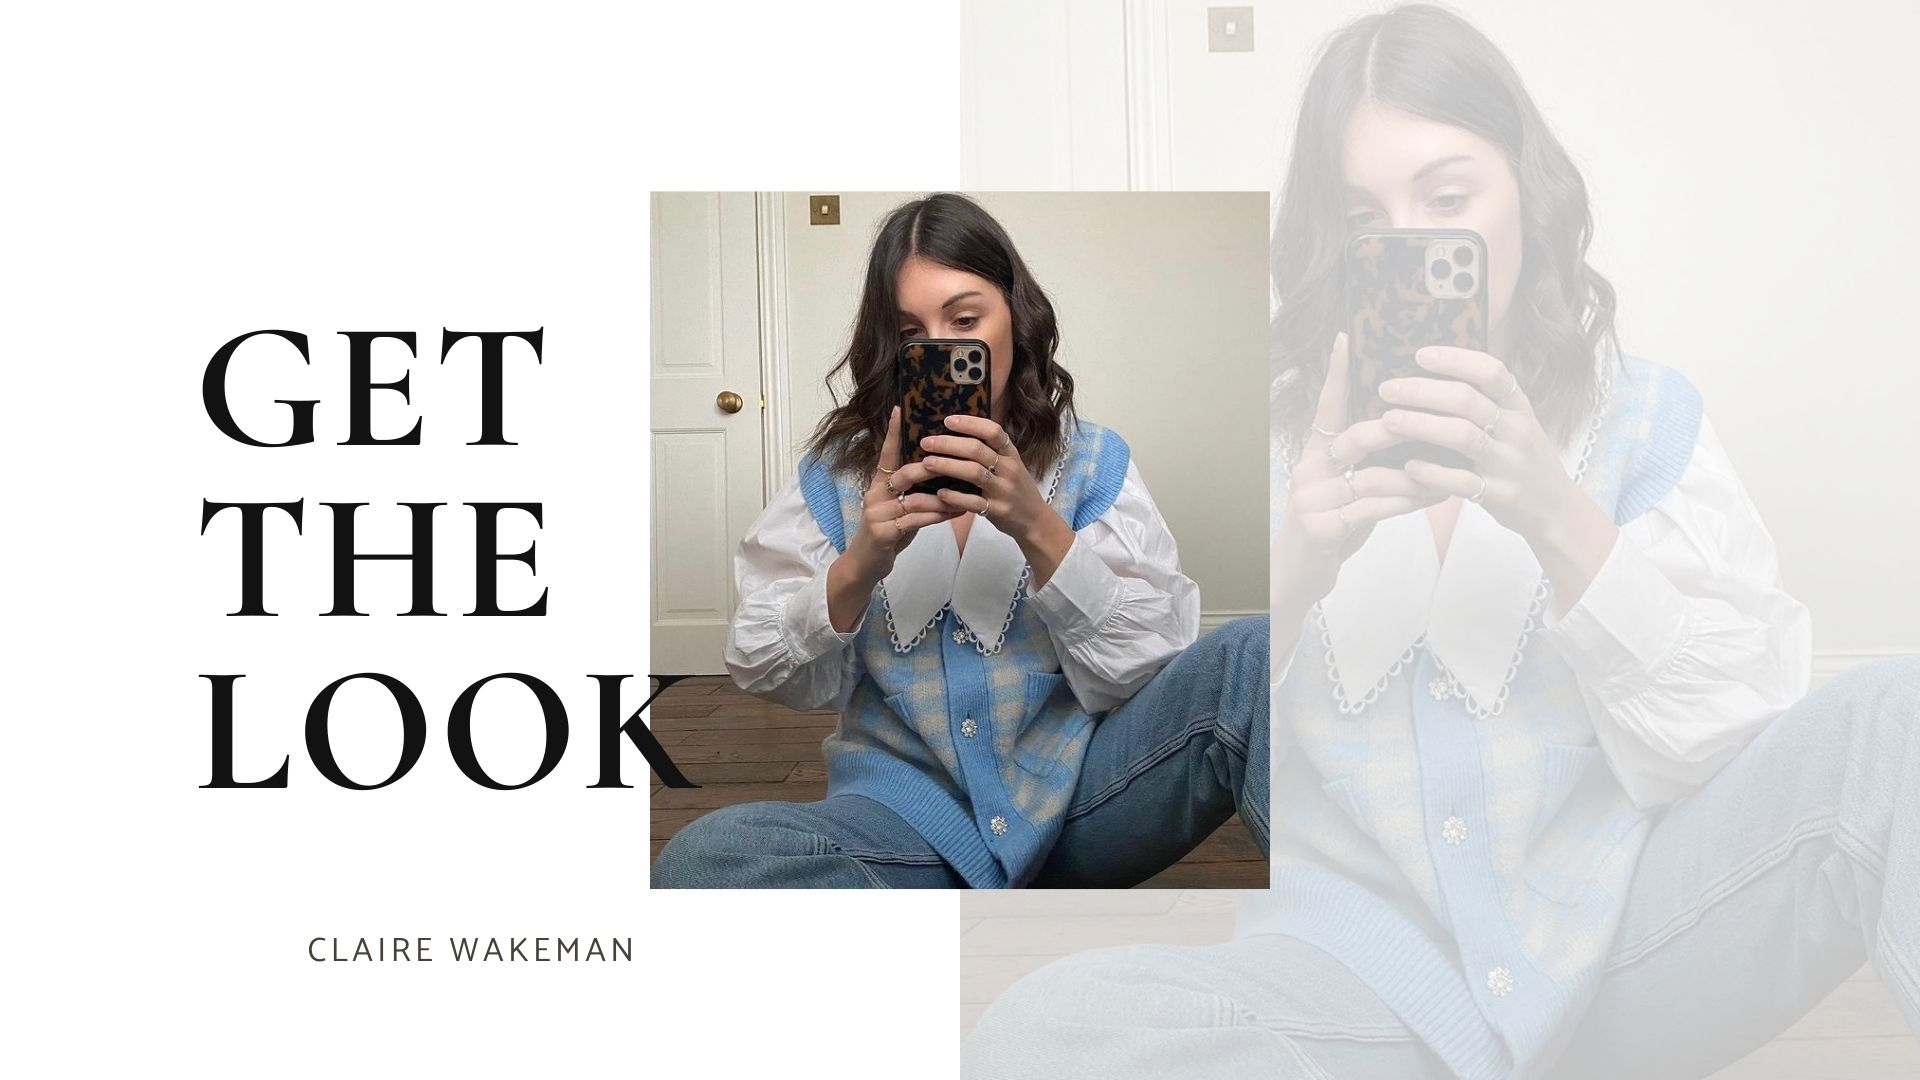 GET THE LOOK (10)